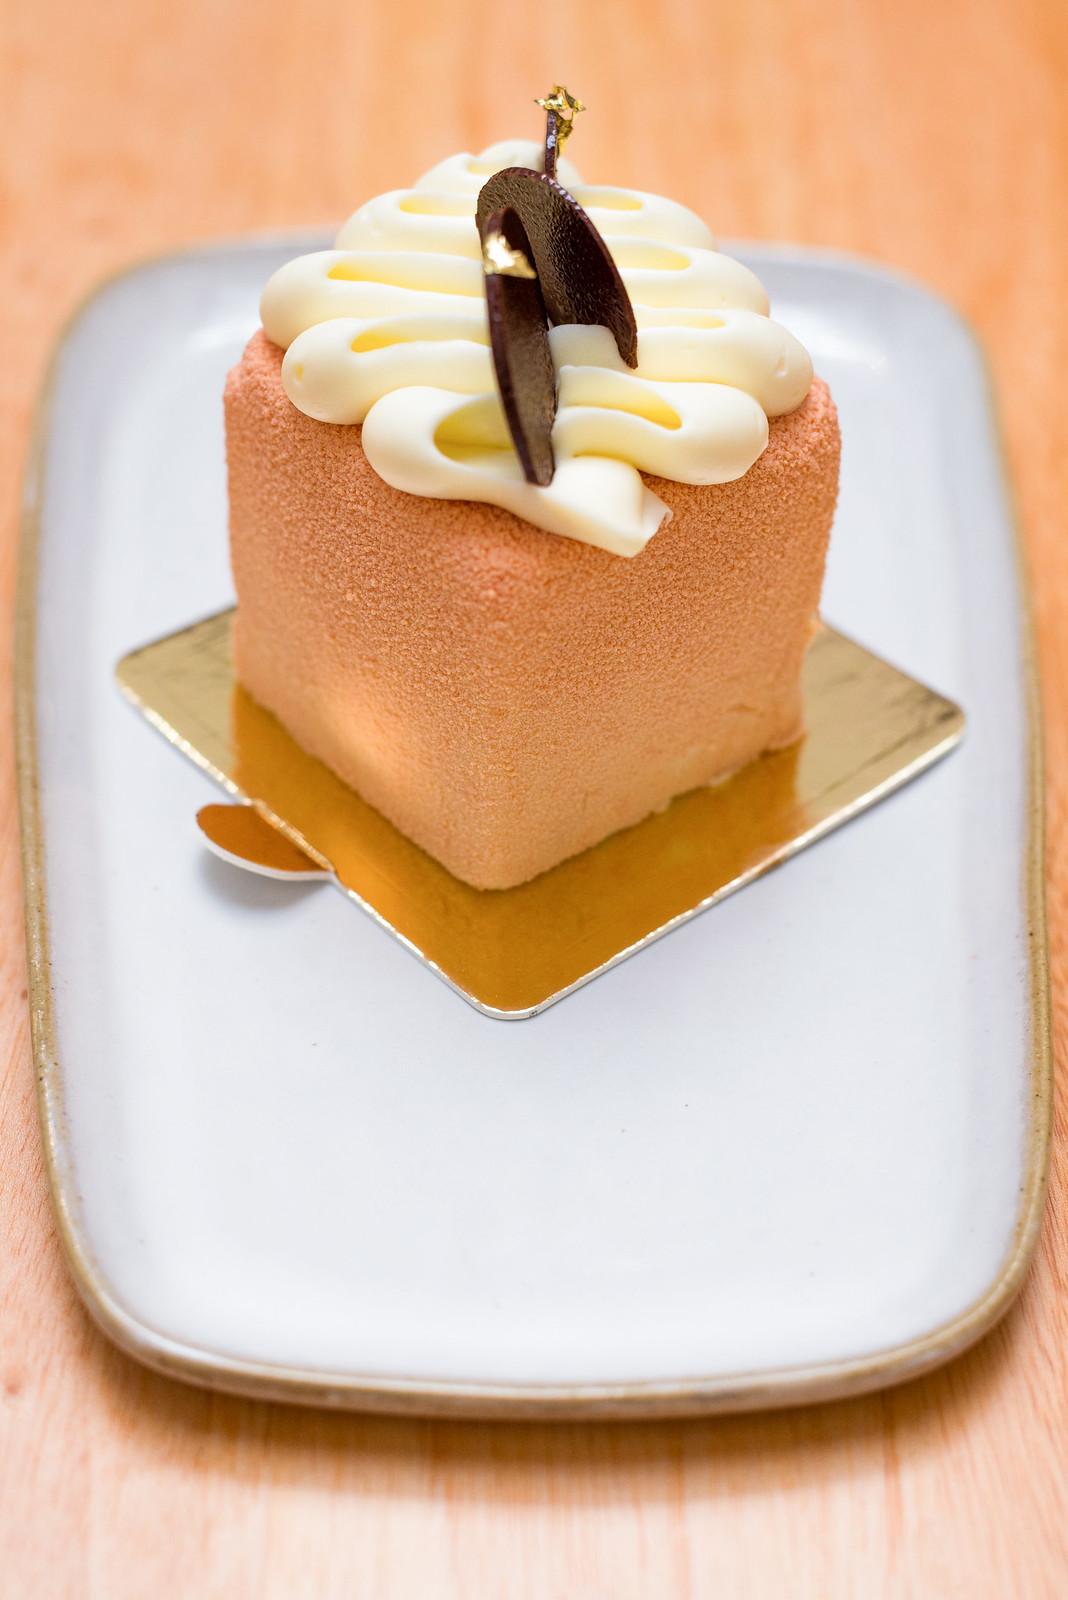 nesuto u2013 ushering in an era of decadent desserts